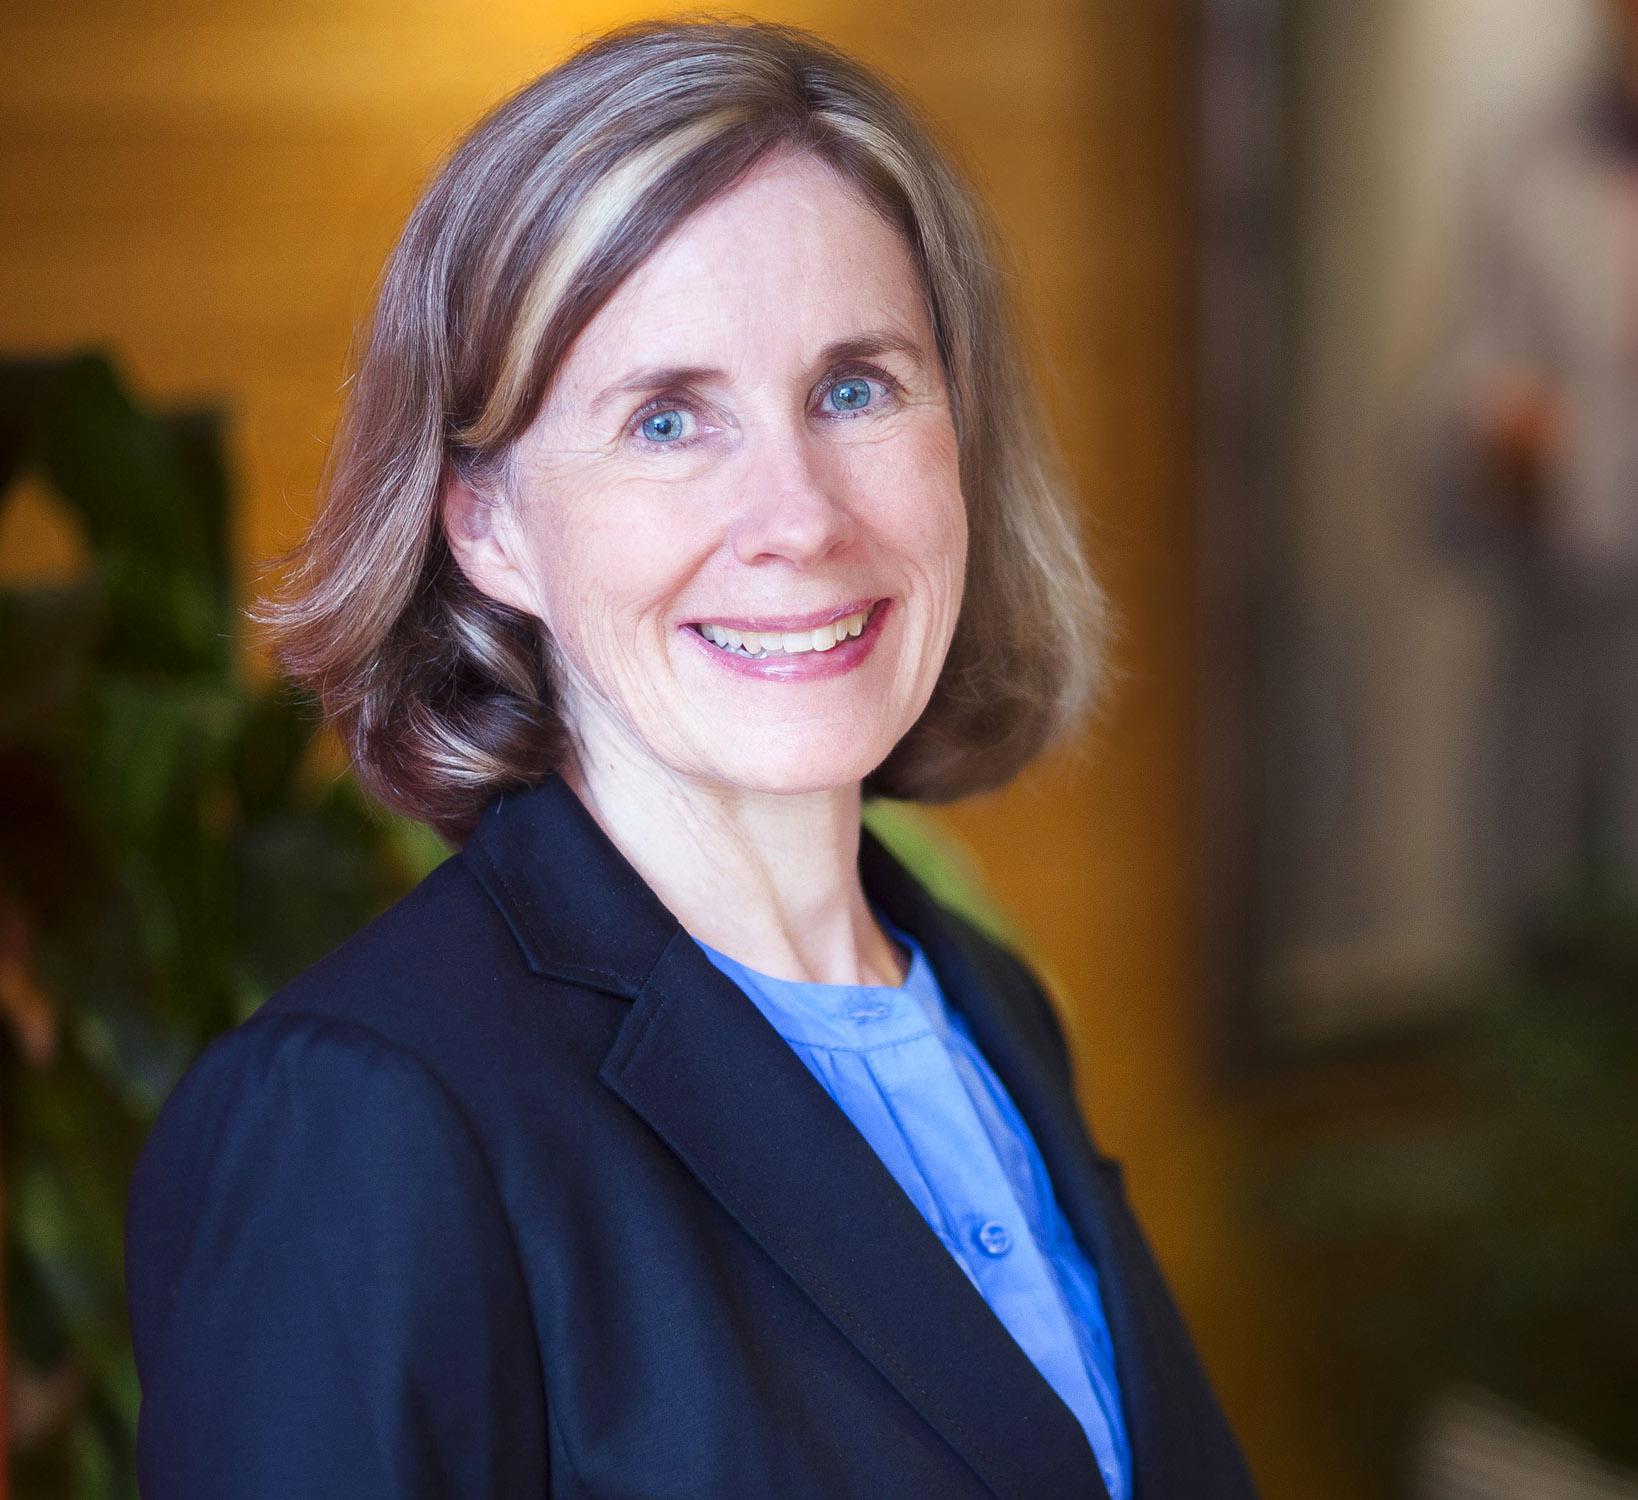 M. Catherine Bushnell, Ph.D.